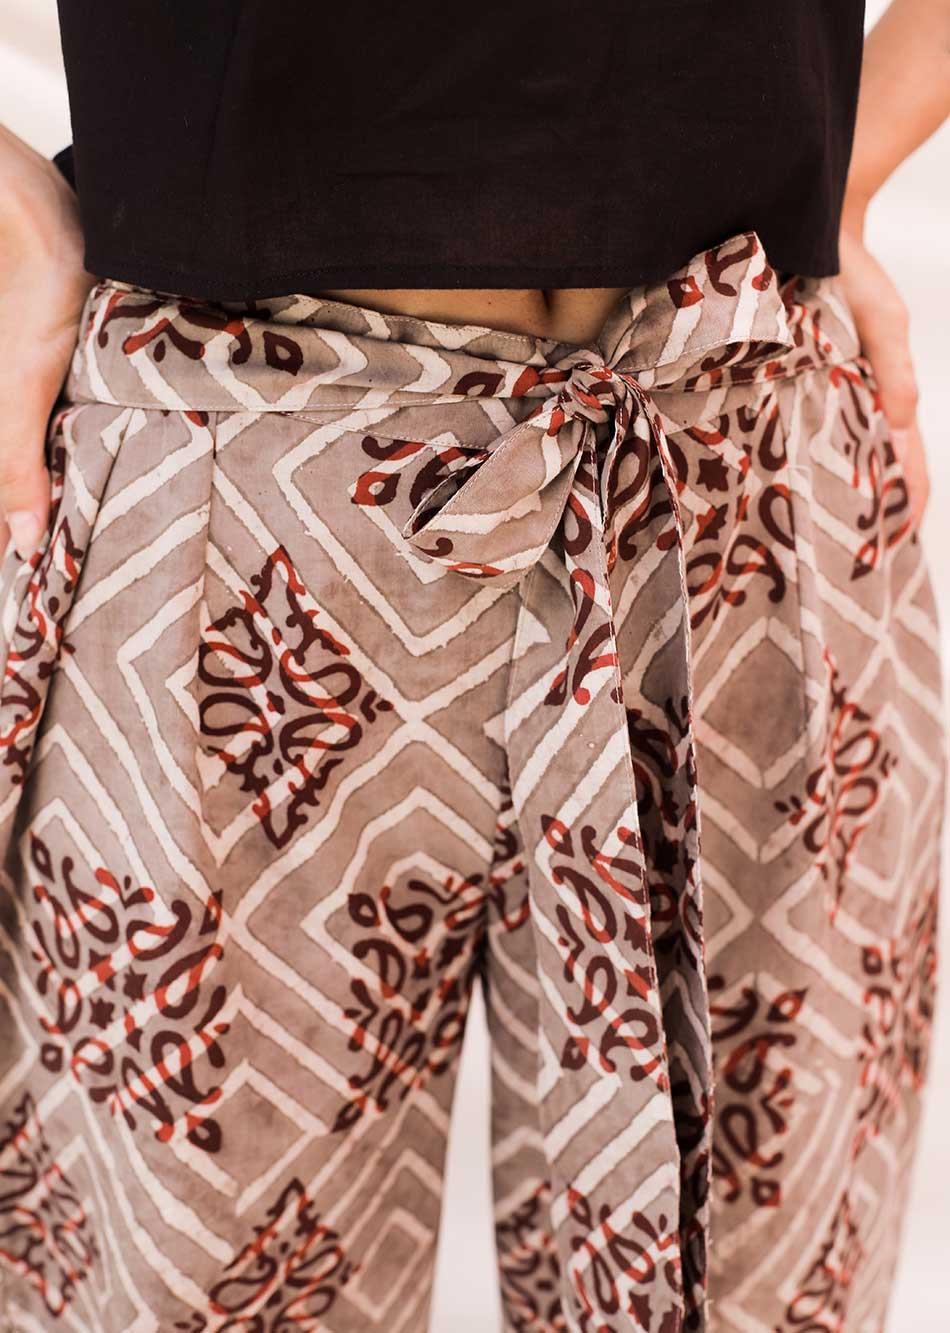 Evening Culottes - (Pants) By Jovi Fashion